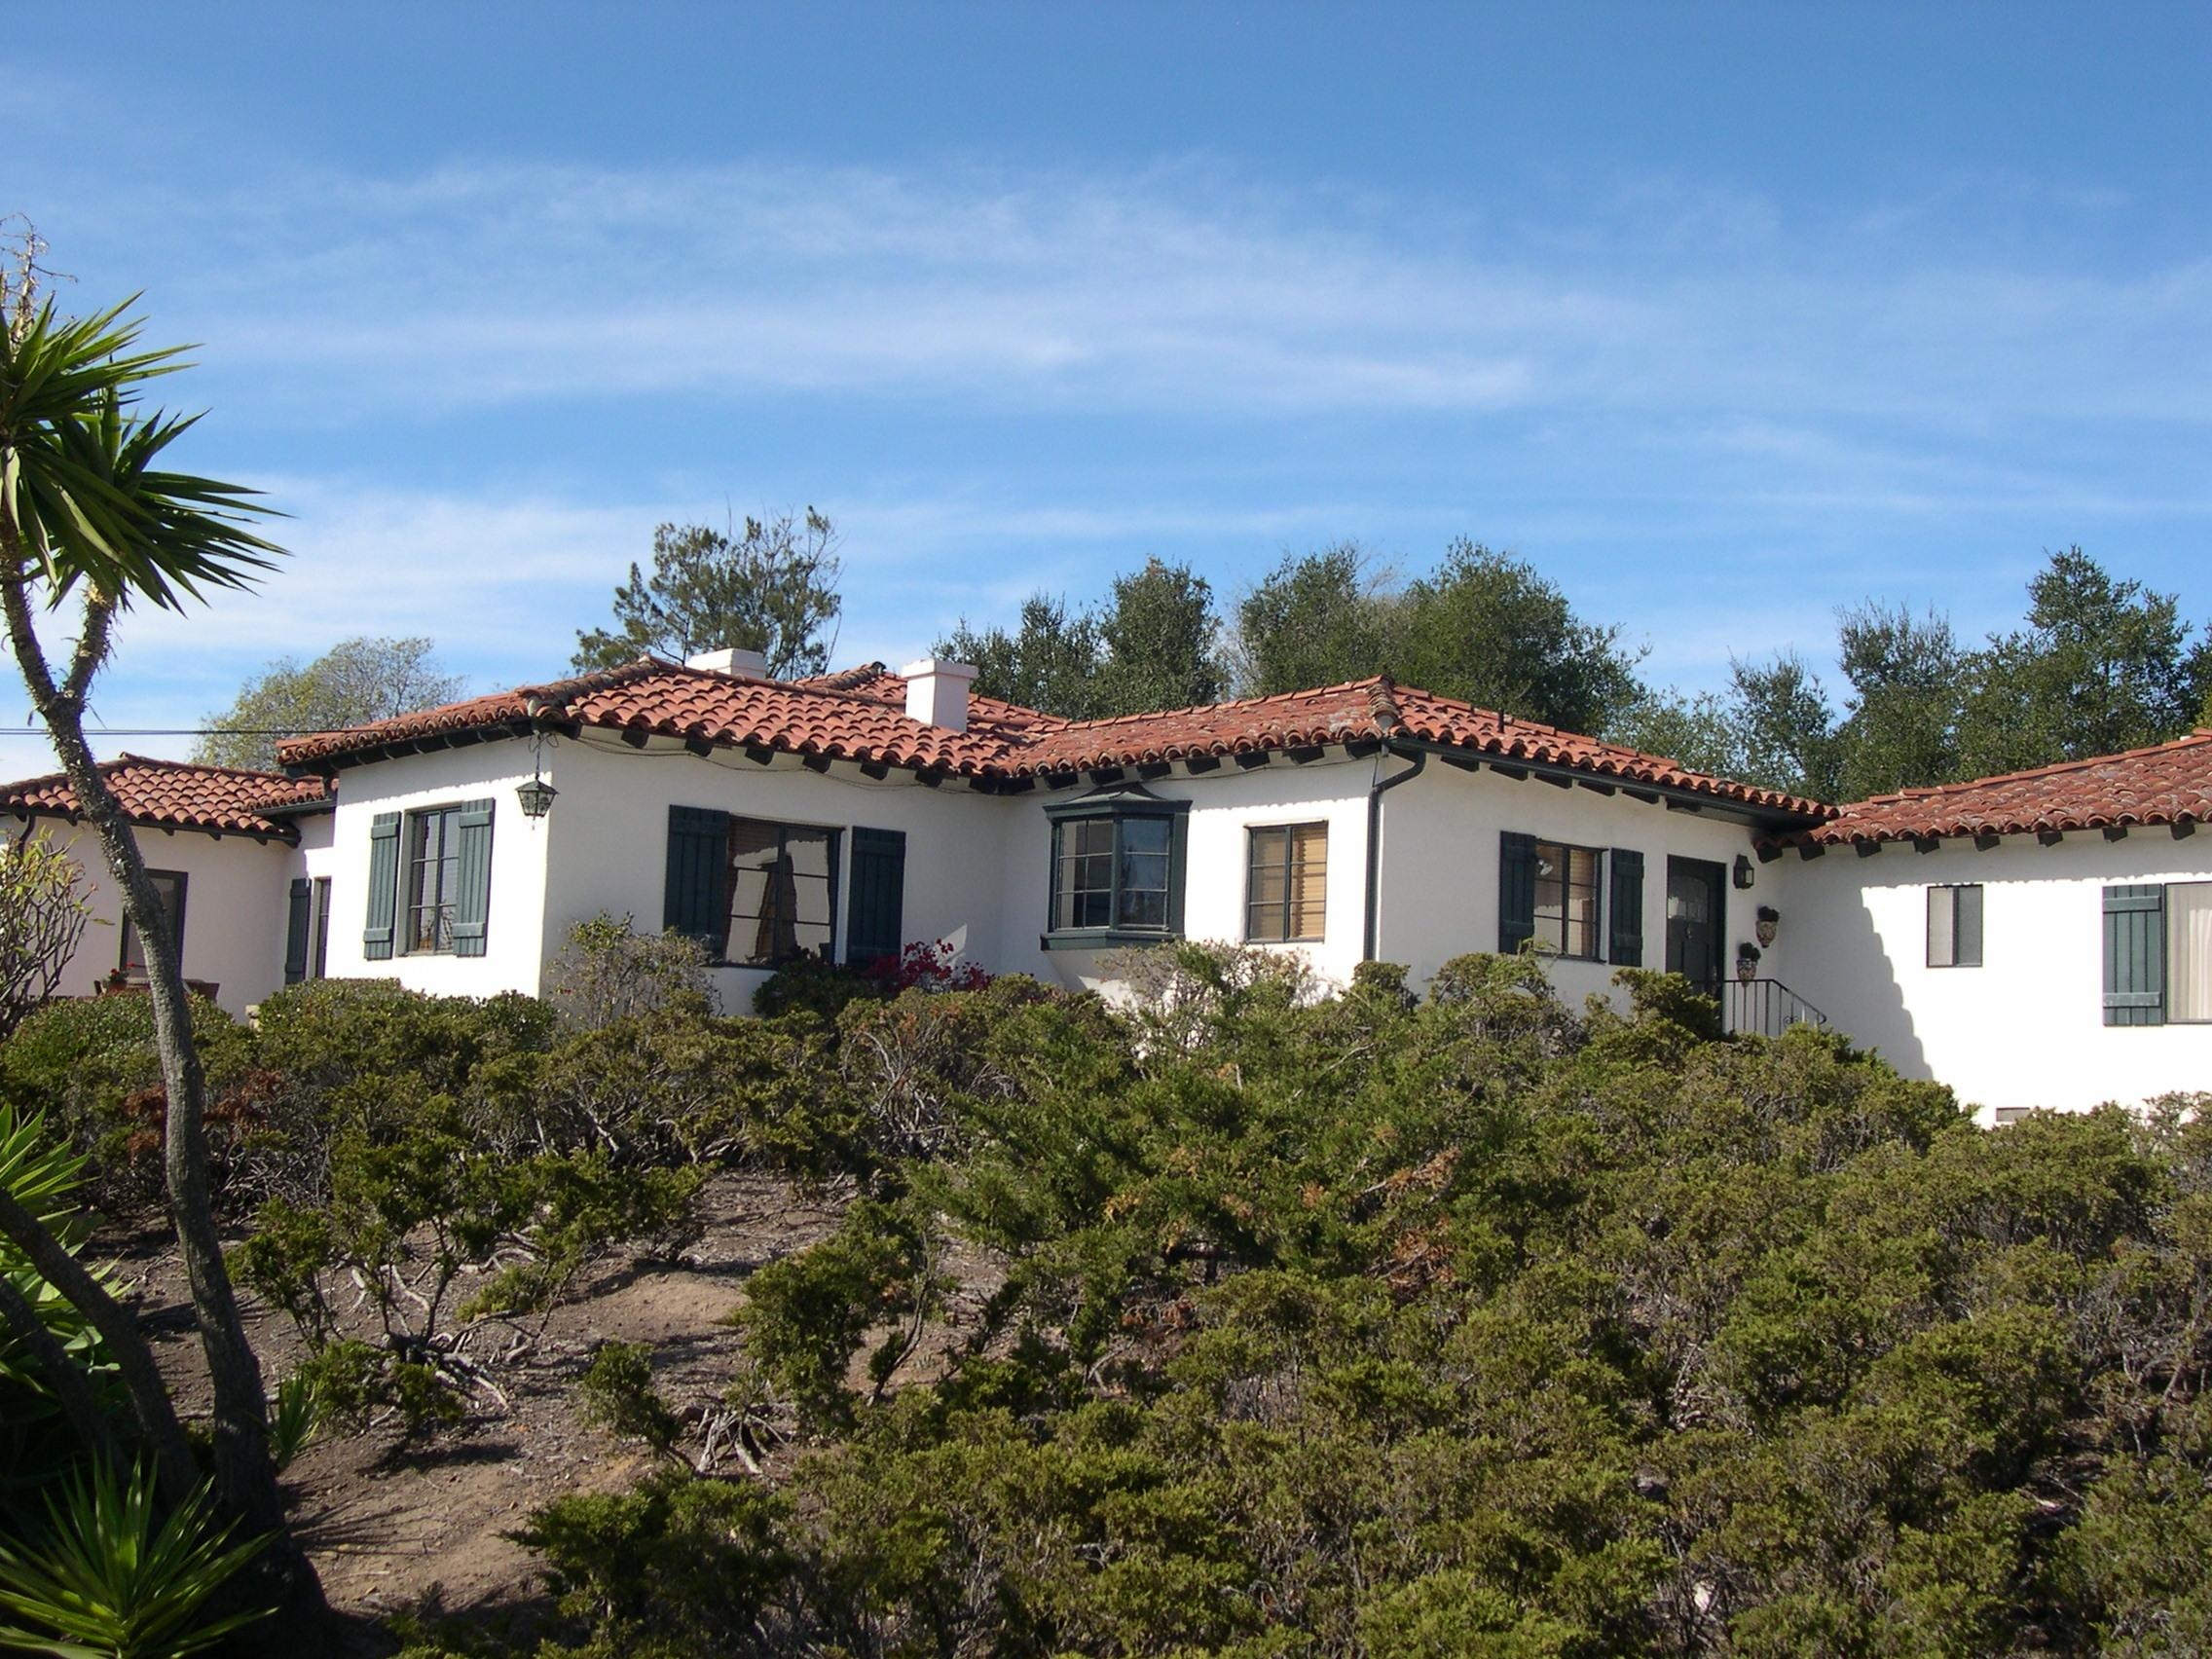 Property photo for 18 La Lita Ln Santa Barbara, California 93105 - 14-458